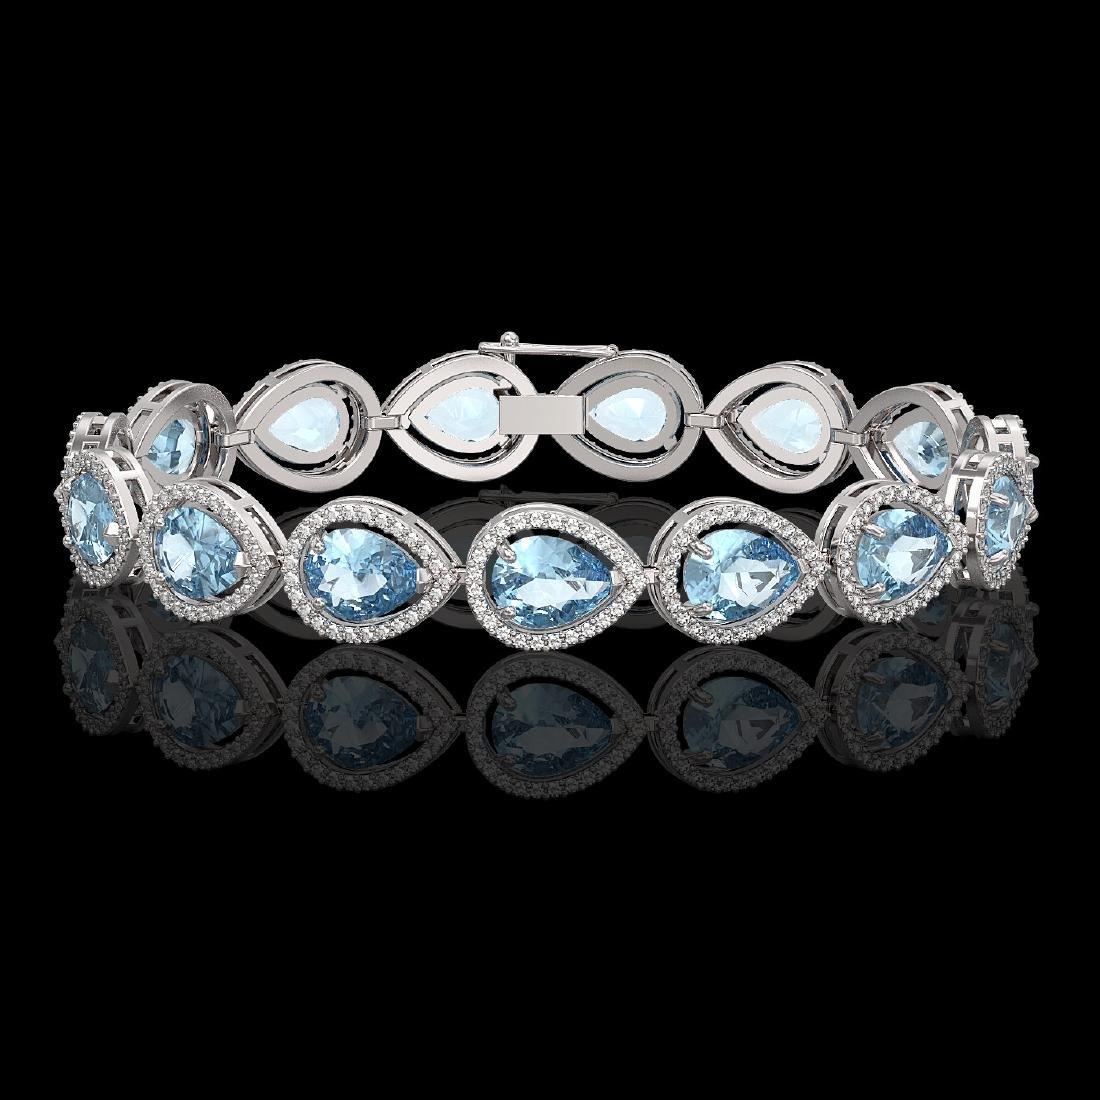 19.85 CTW Aquamarine & Diamond Halo Bracelet 10K White